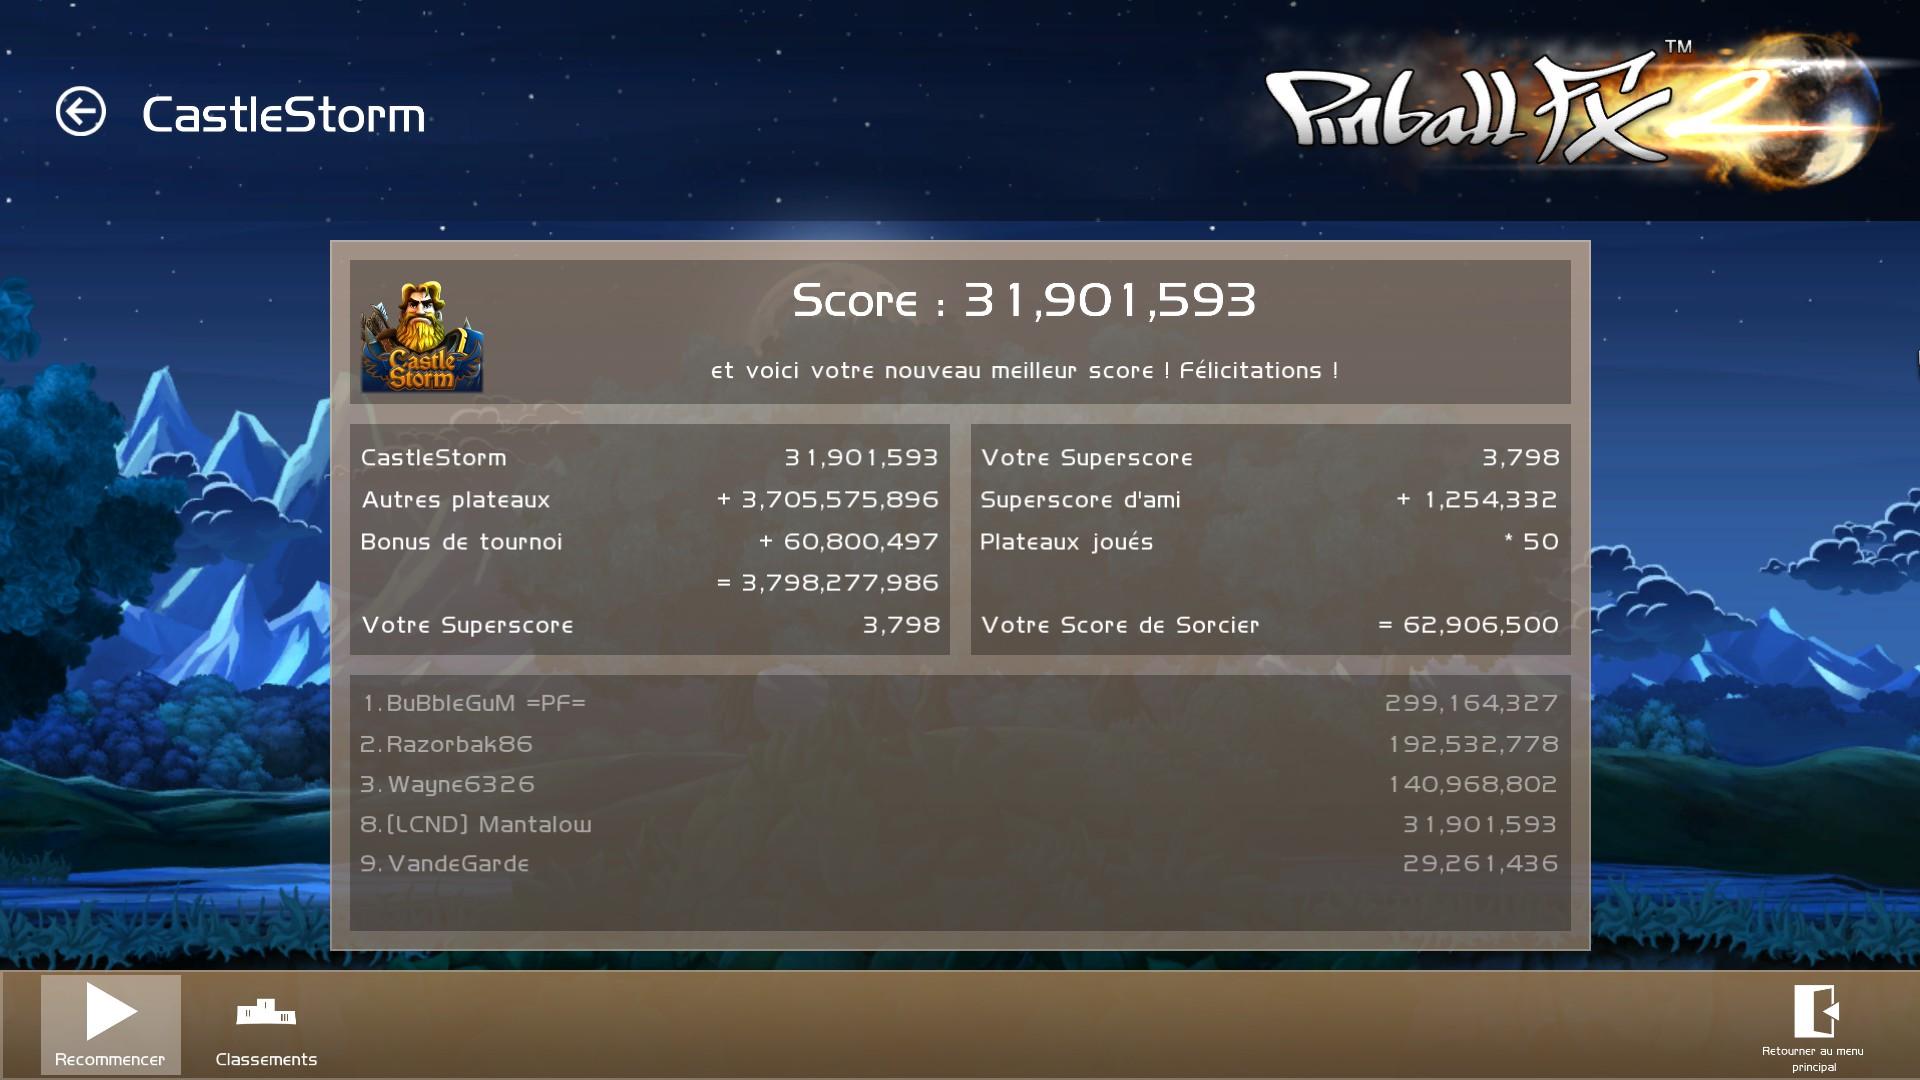 Mantalow: Pinball FX2: Castle Storm (PC) 31,901,593 points on 2015-03-12 03:44:27